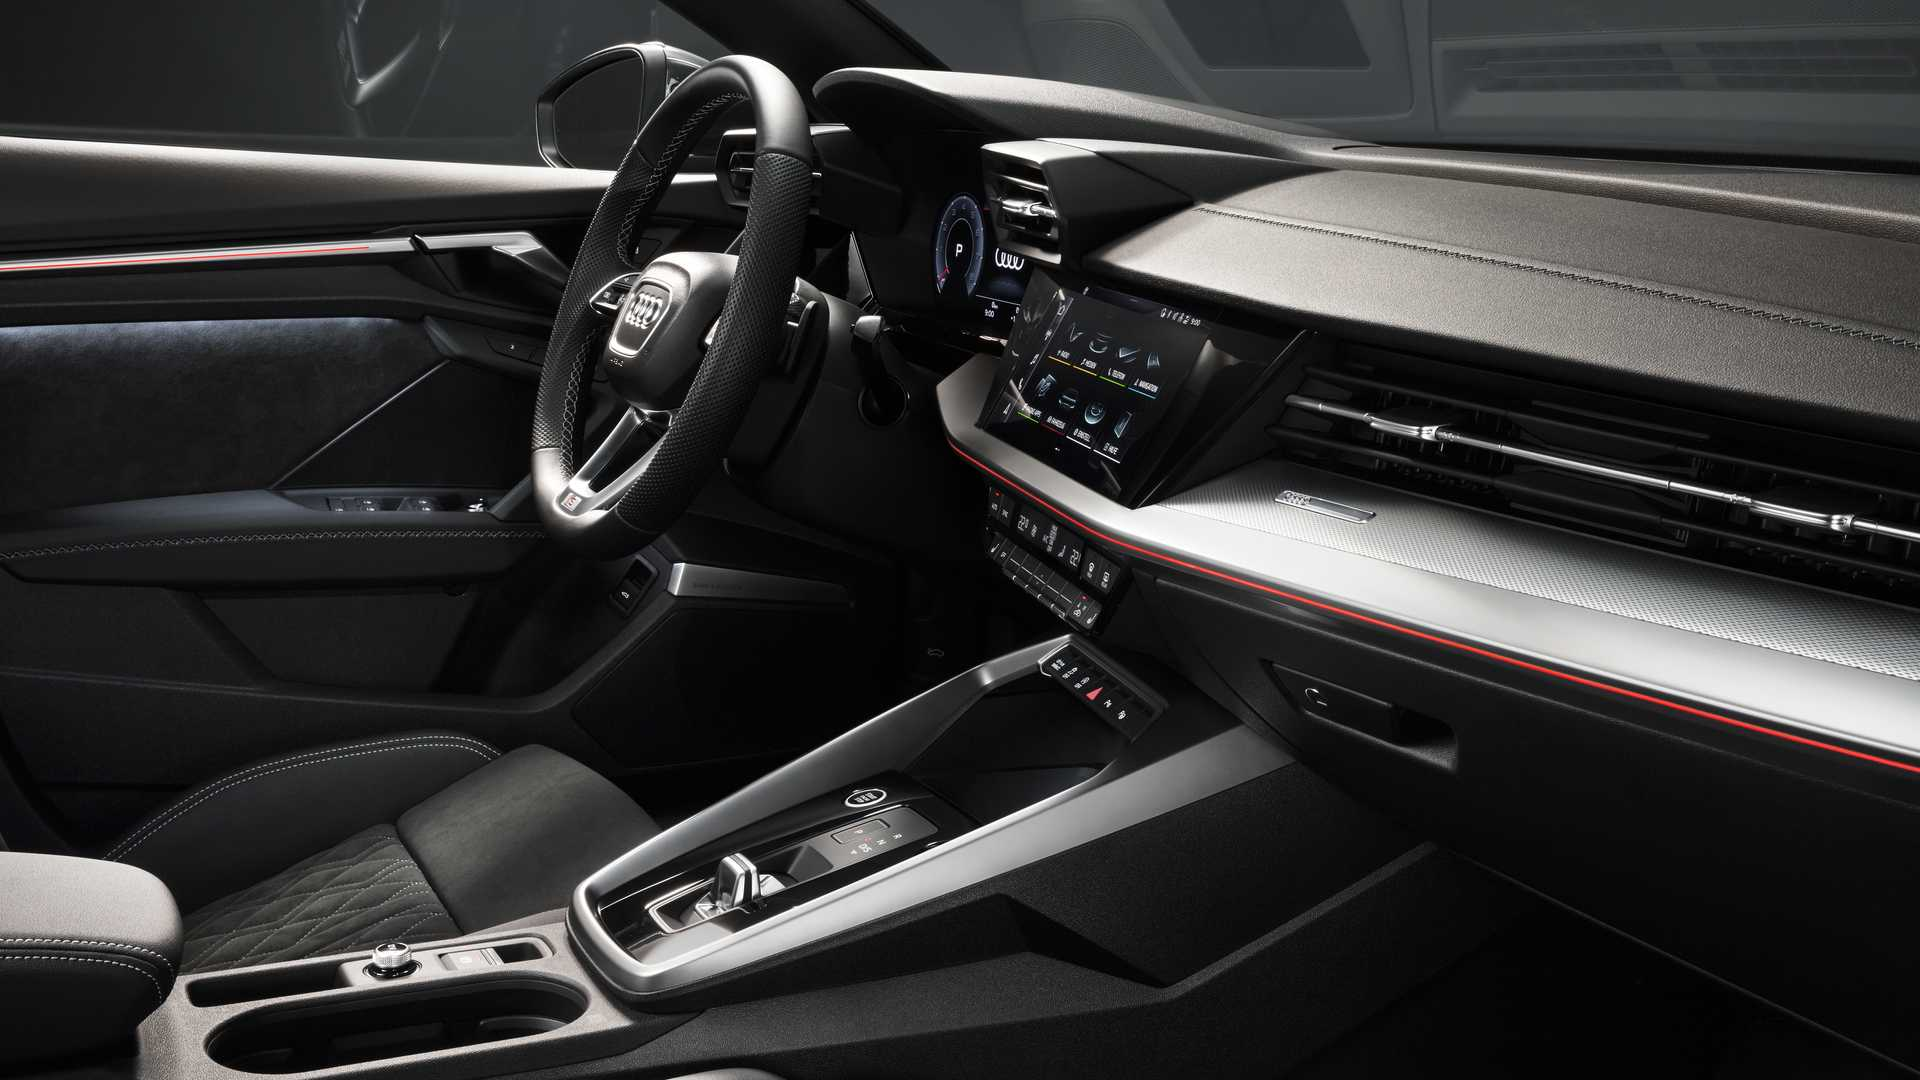 2021-audi-a3-sedan-debut-2.jpg